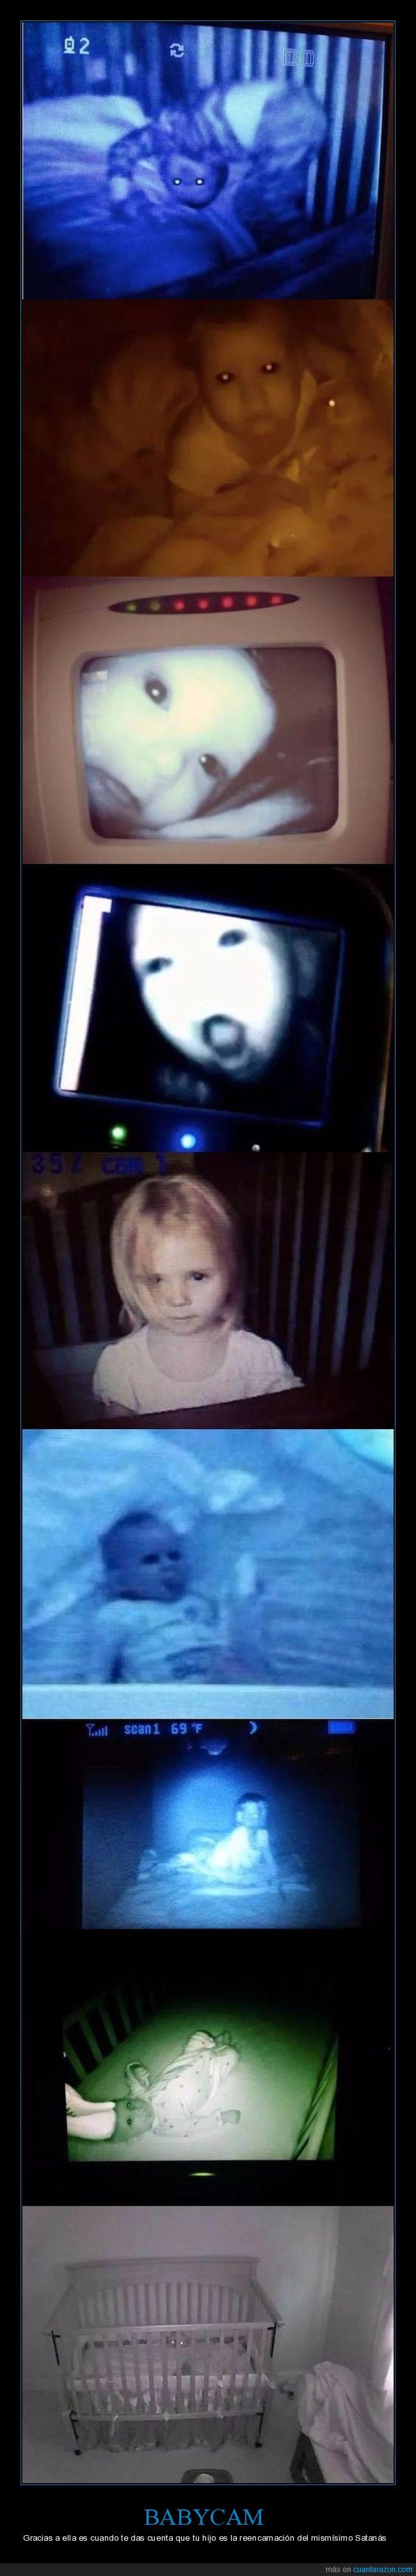 babycam,bebés,cámara,ojos